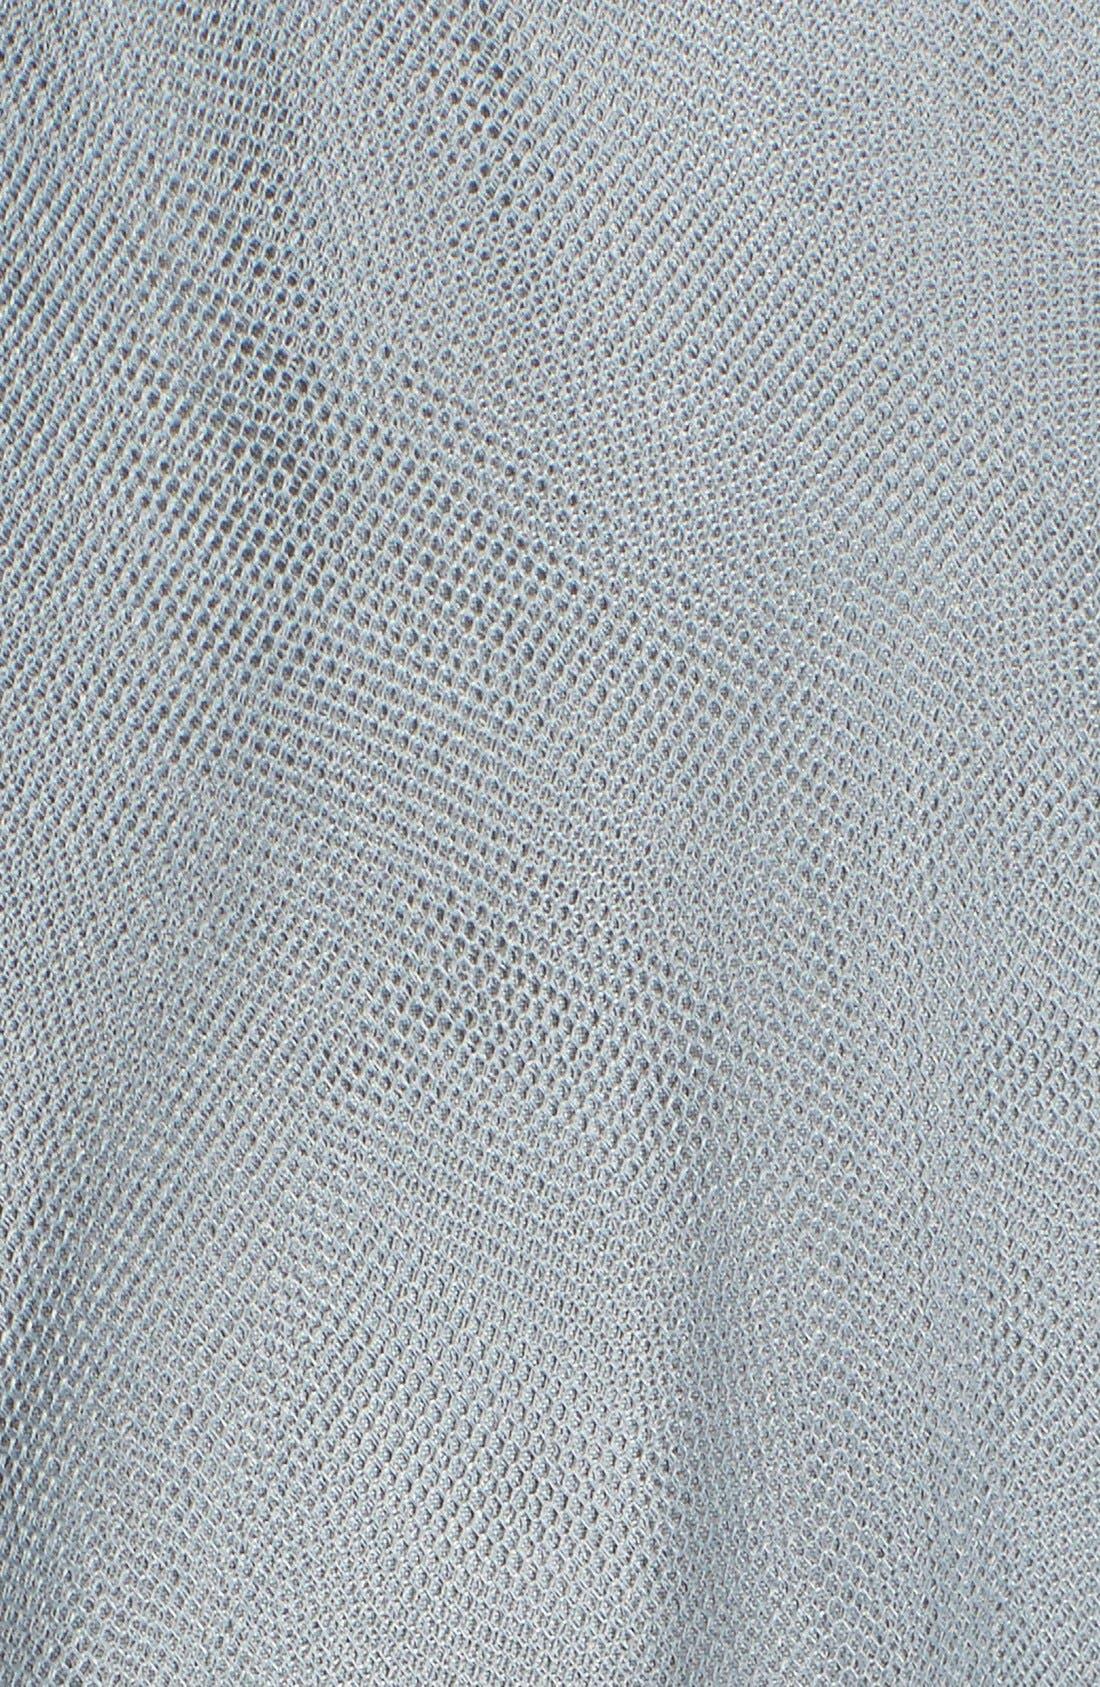 Back Cutout Pleat Tulle Gown,                             Alternate thumbnail 5, color,                             Sea